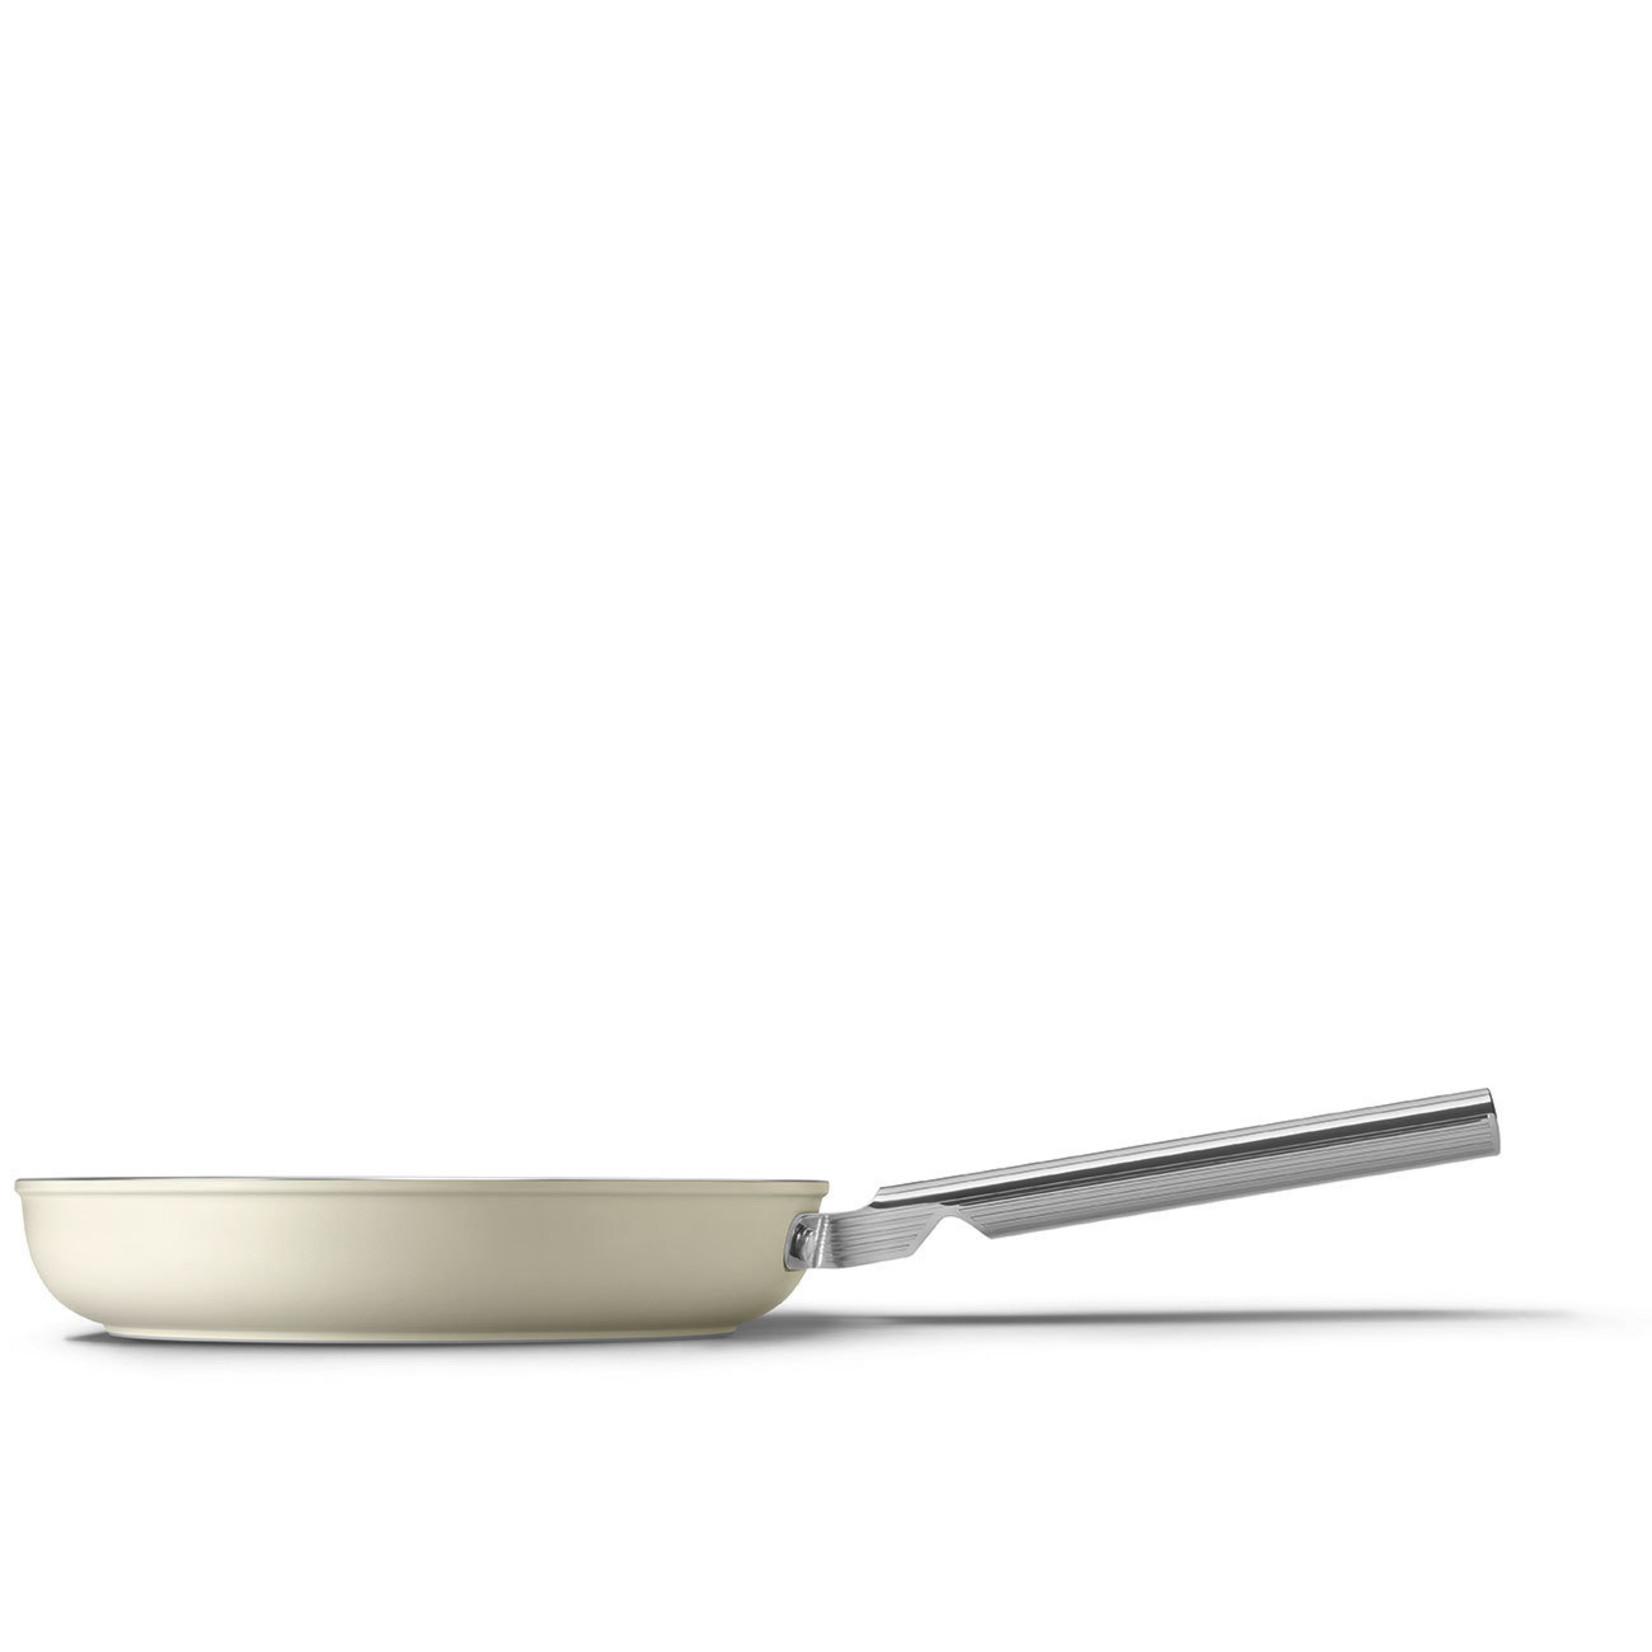 Smeg SMEG Koekenpan 30 cm, anti-aanbaklaag, crème mat